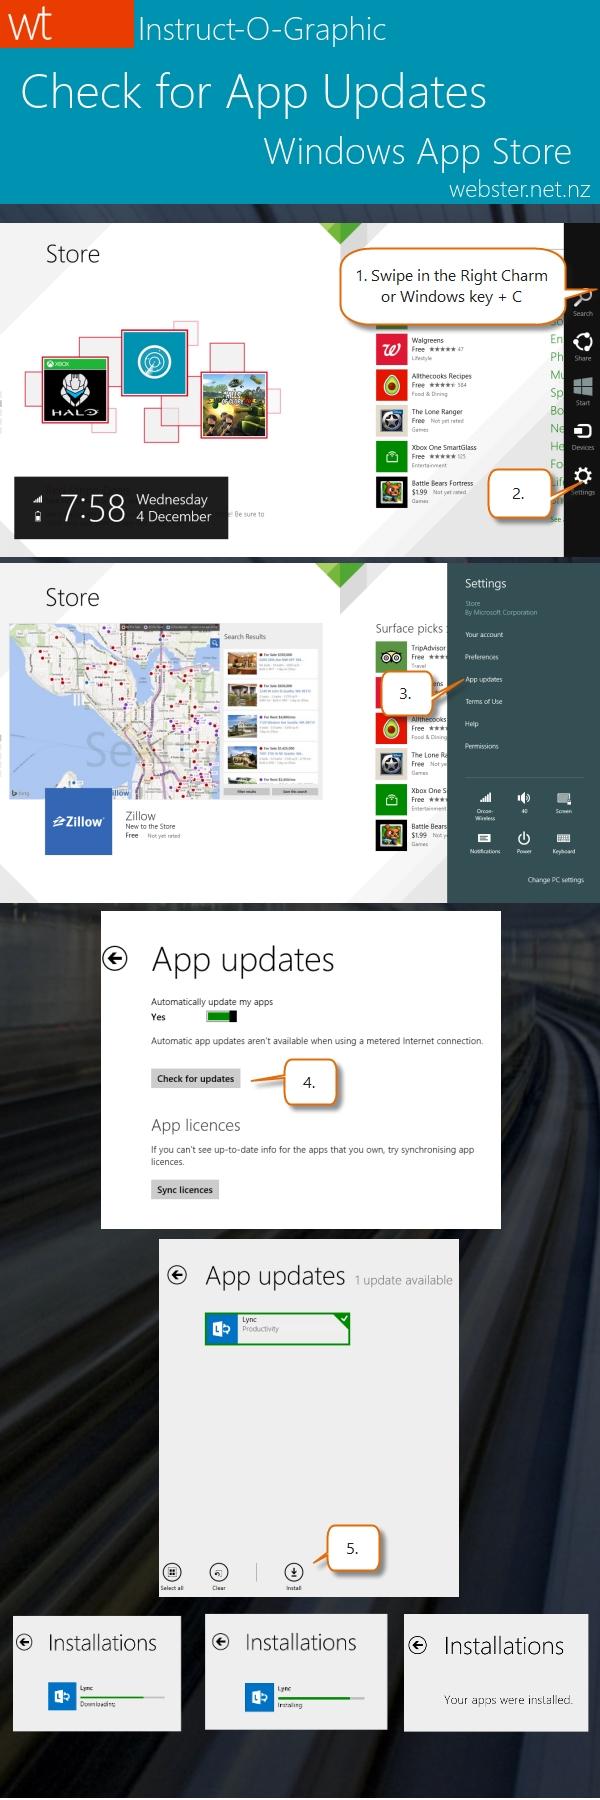 Instruct-O-Graphic_WindowsAppStore_CheckForAppUpdates